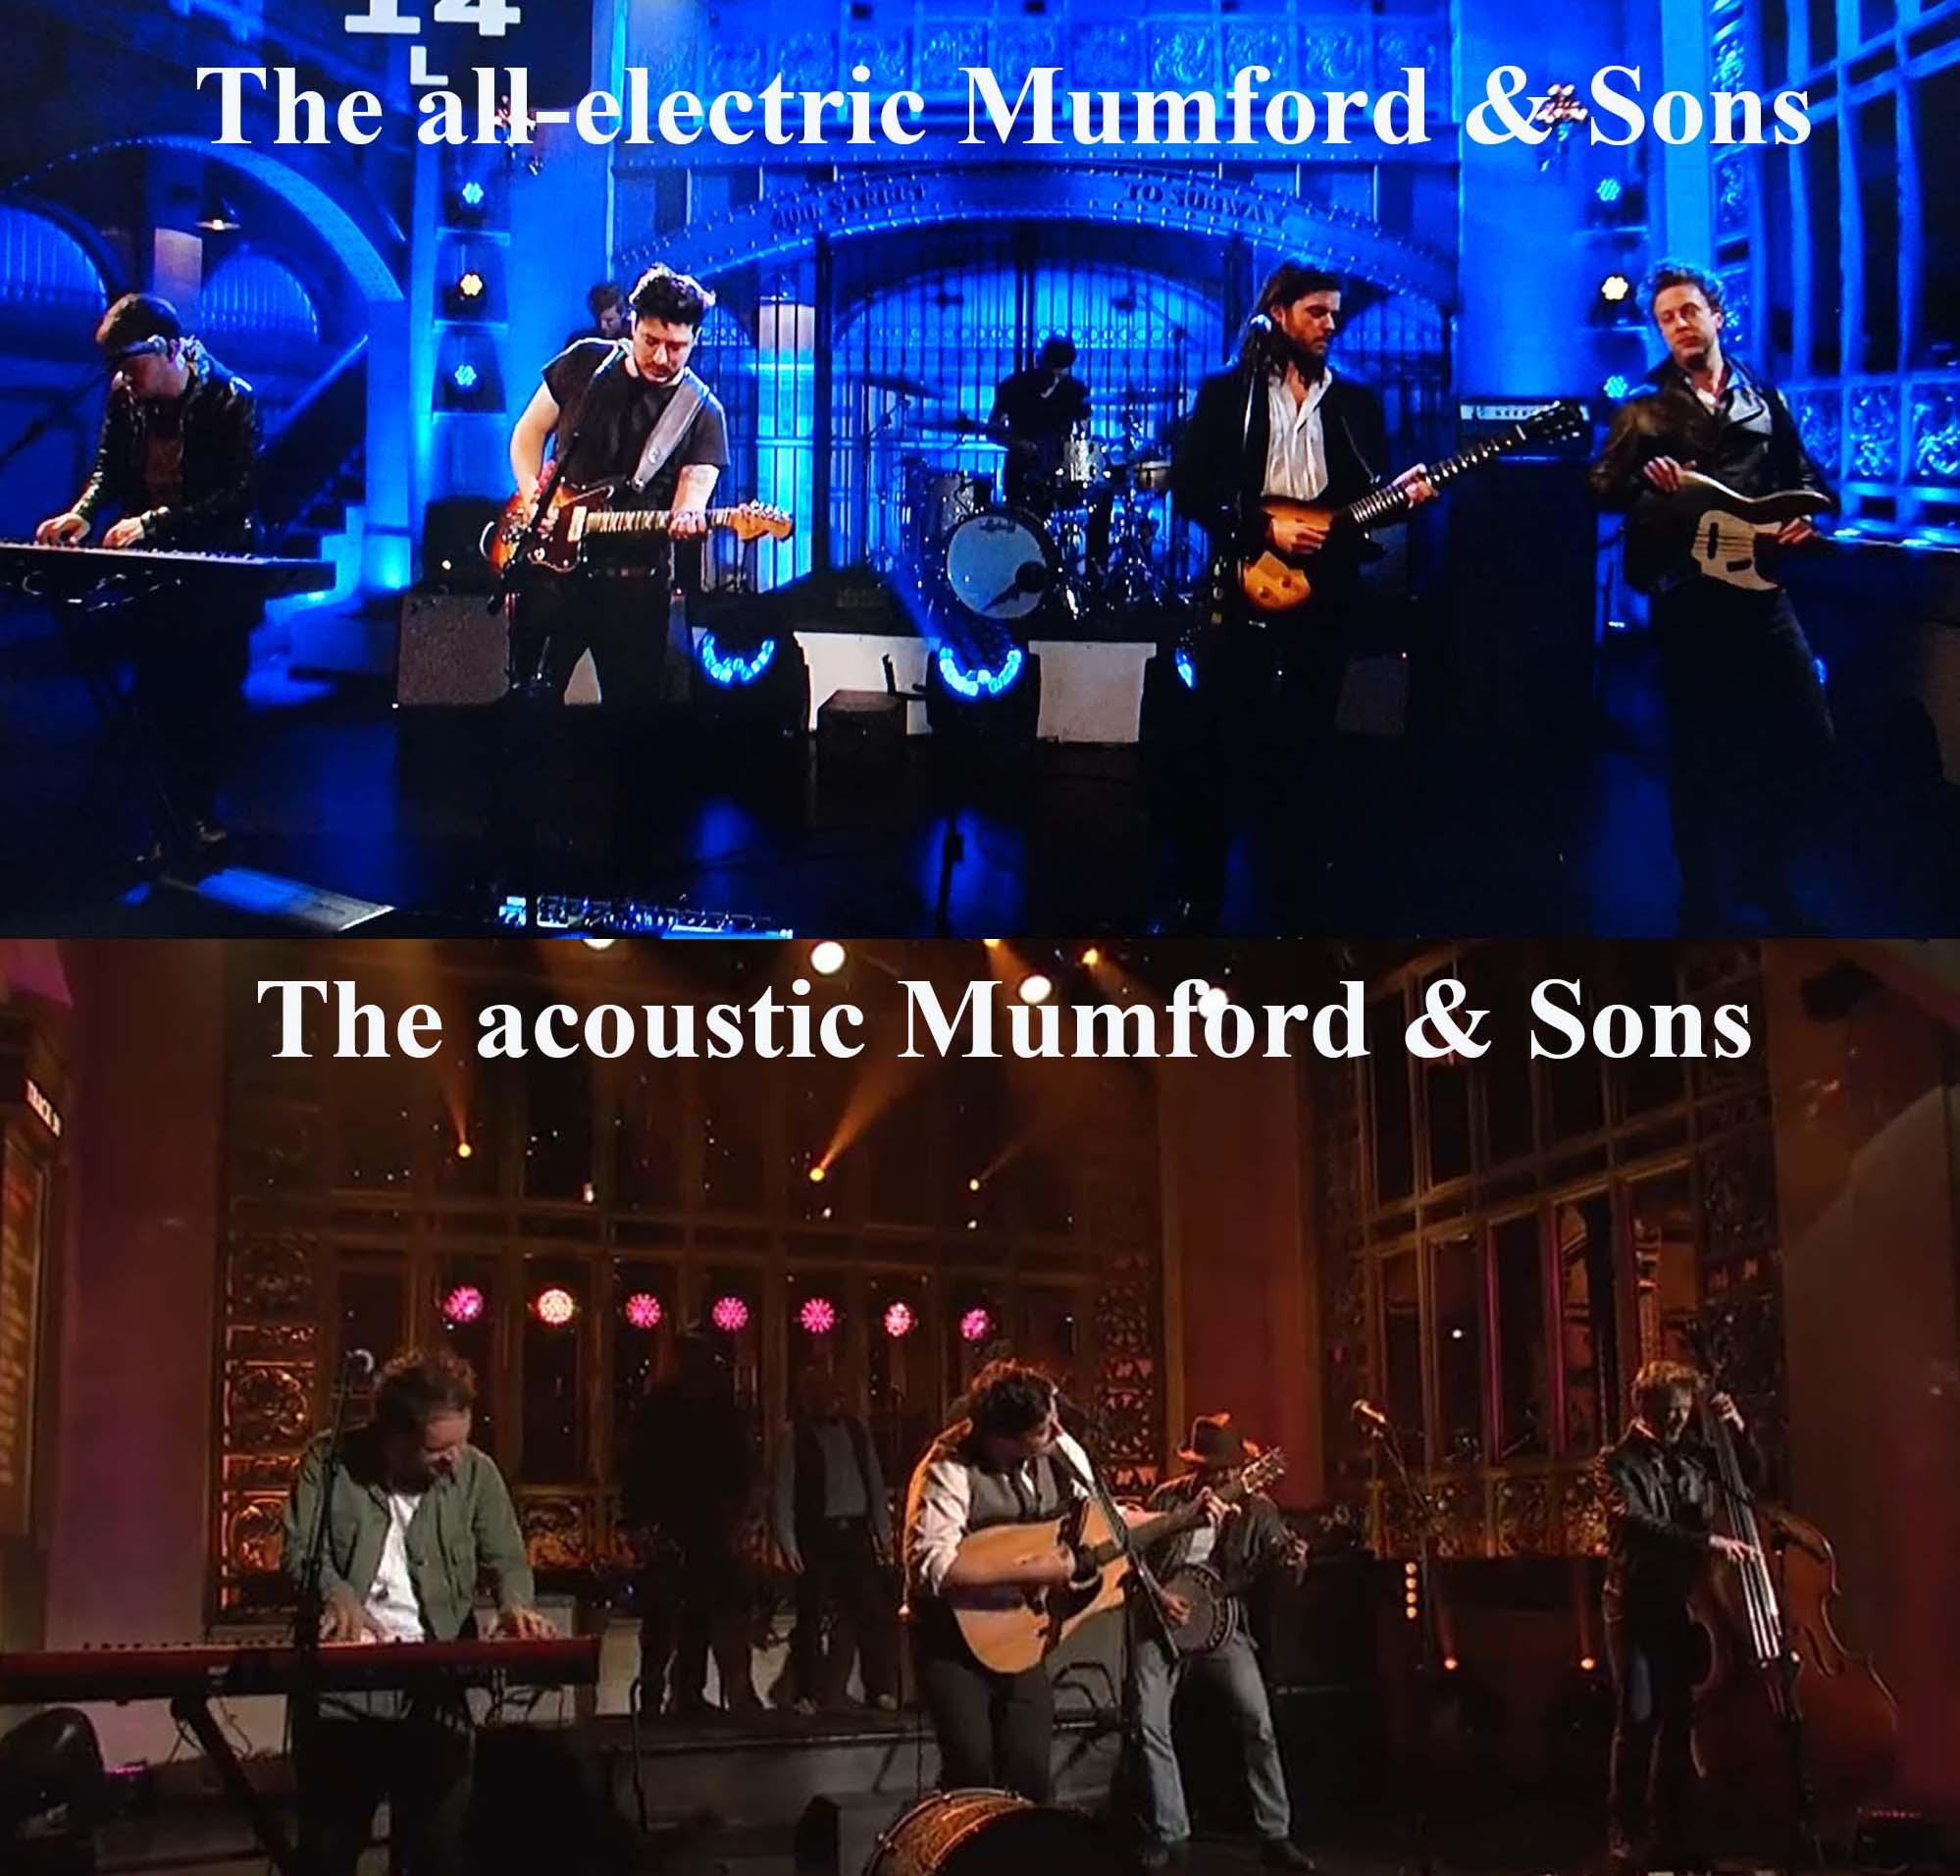 Mumford & Sons electric